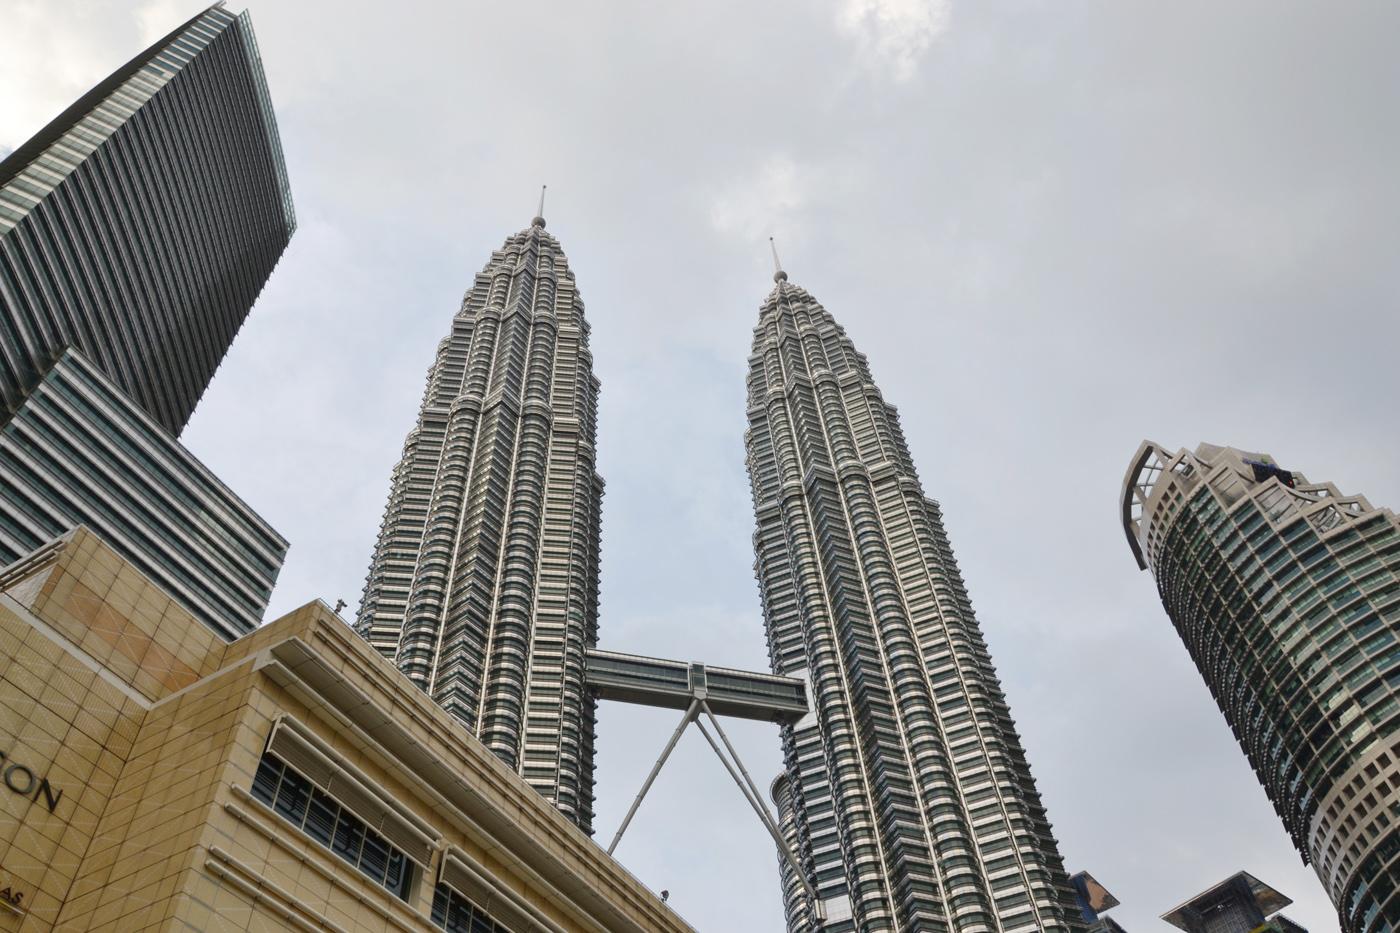 What-to-do-in-Kuala-Lumpur-petronas-tower-2